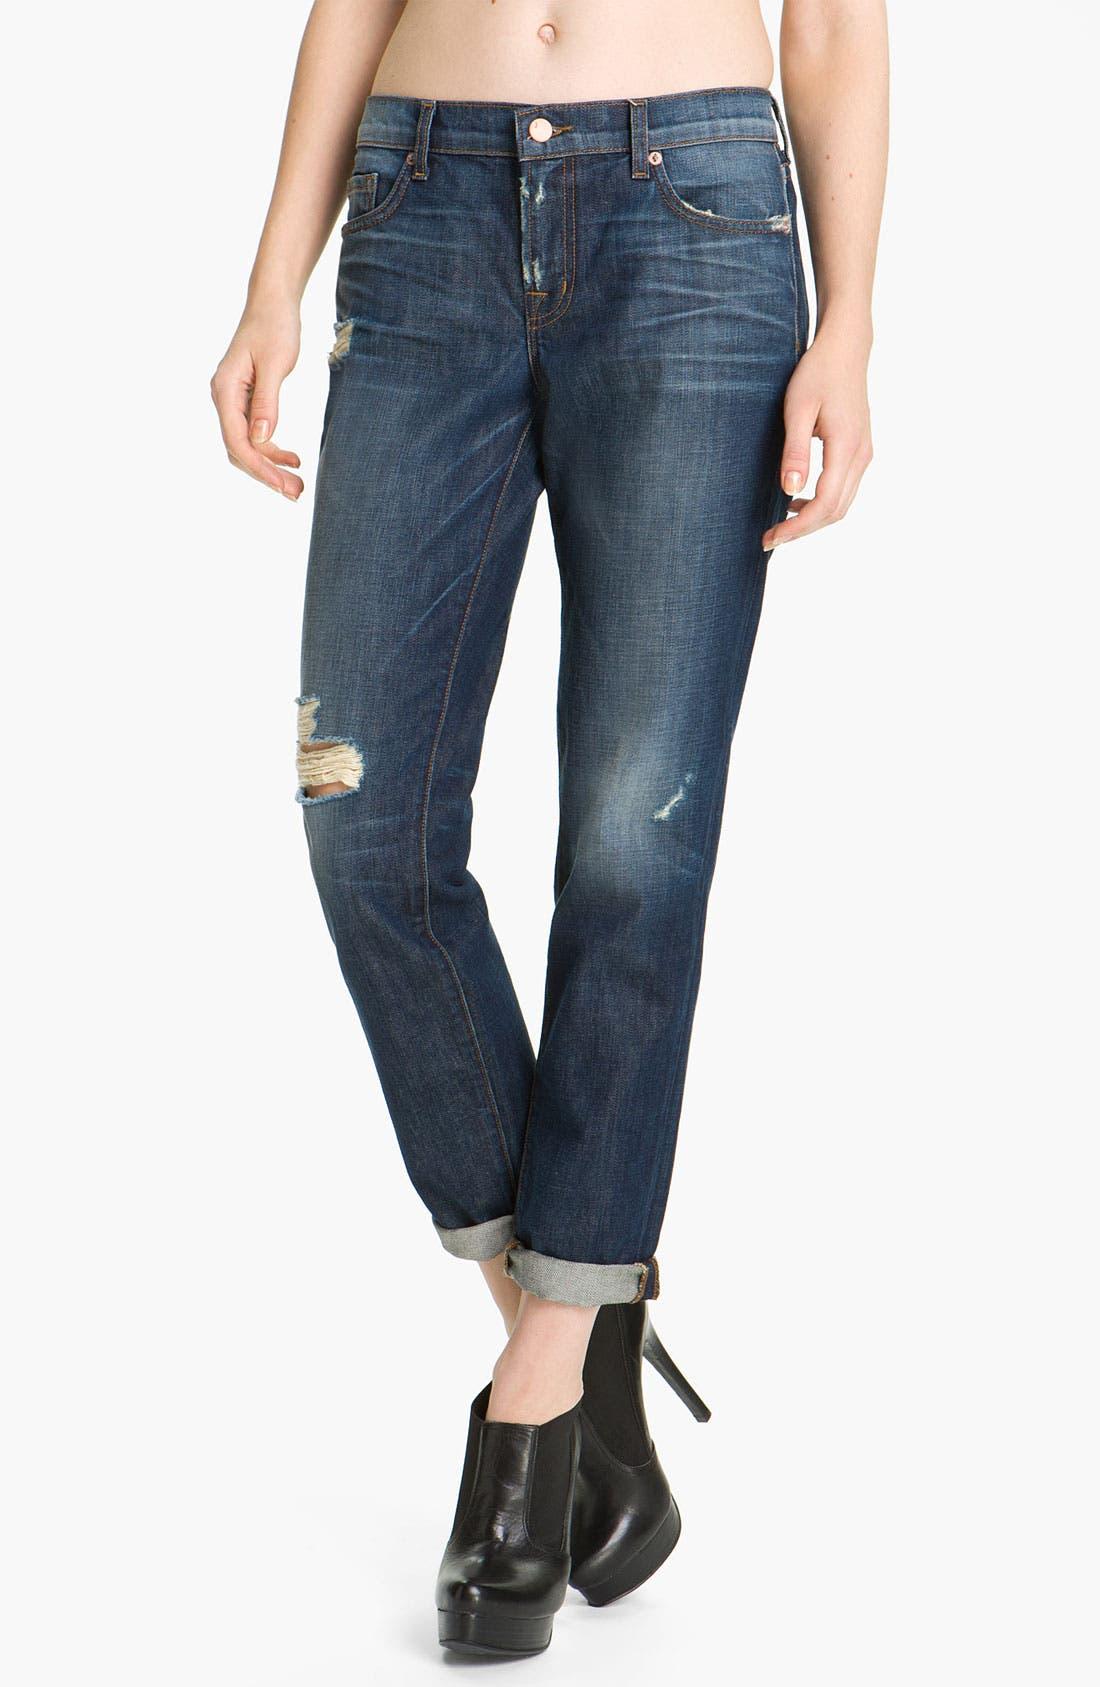 Main Image - J Brand 'Aidan' Distressed Boyfriend Fit Jeans (Ringer)